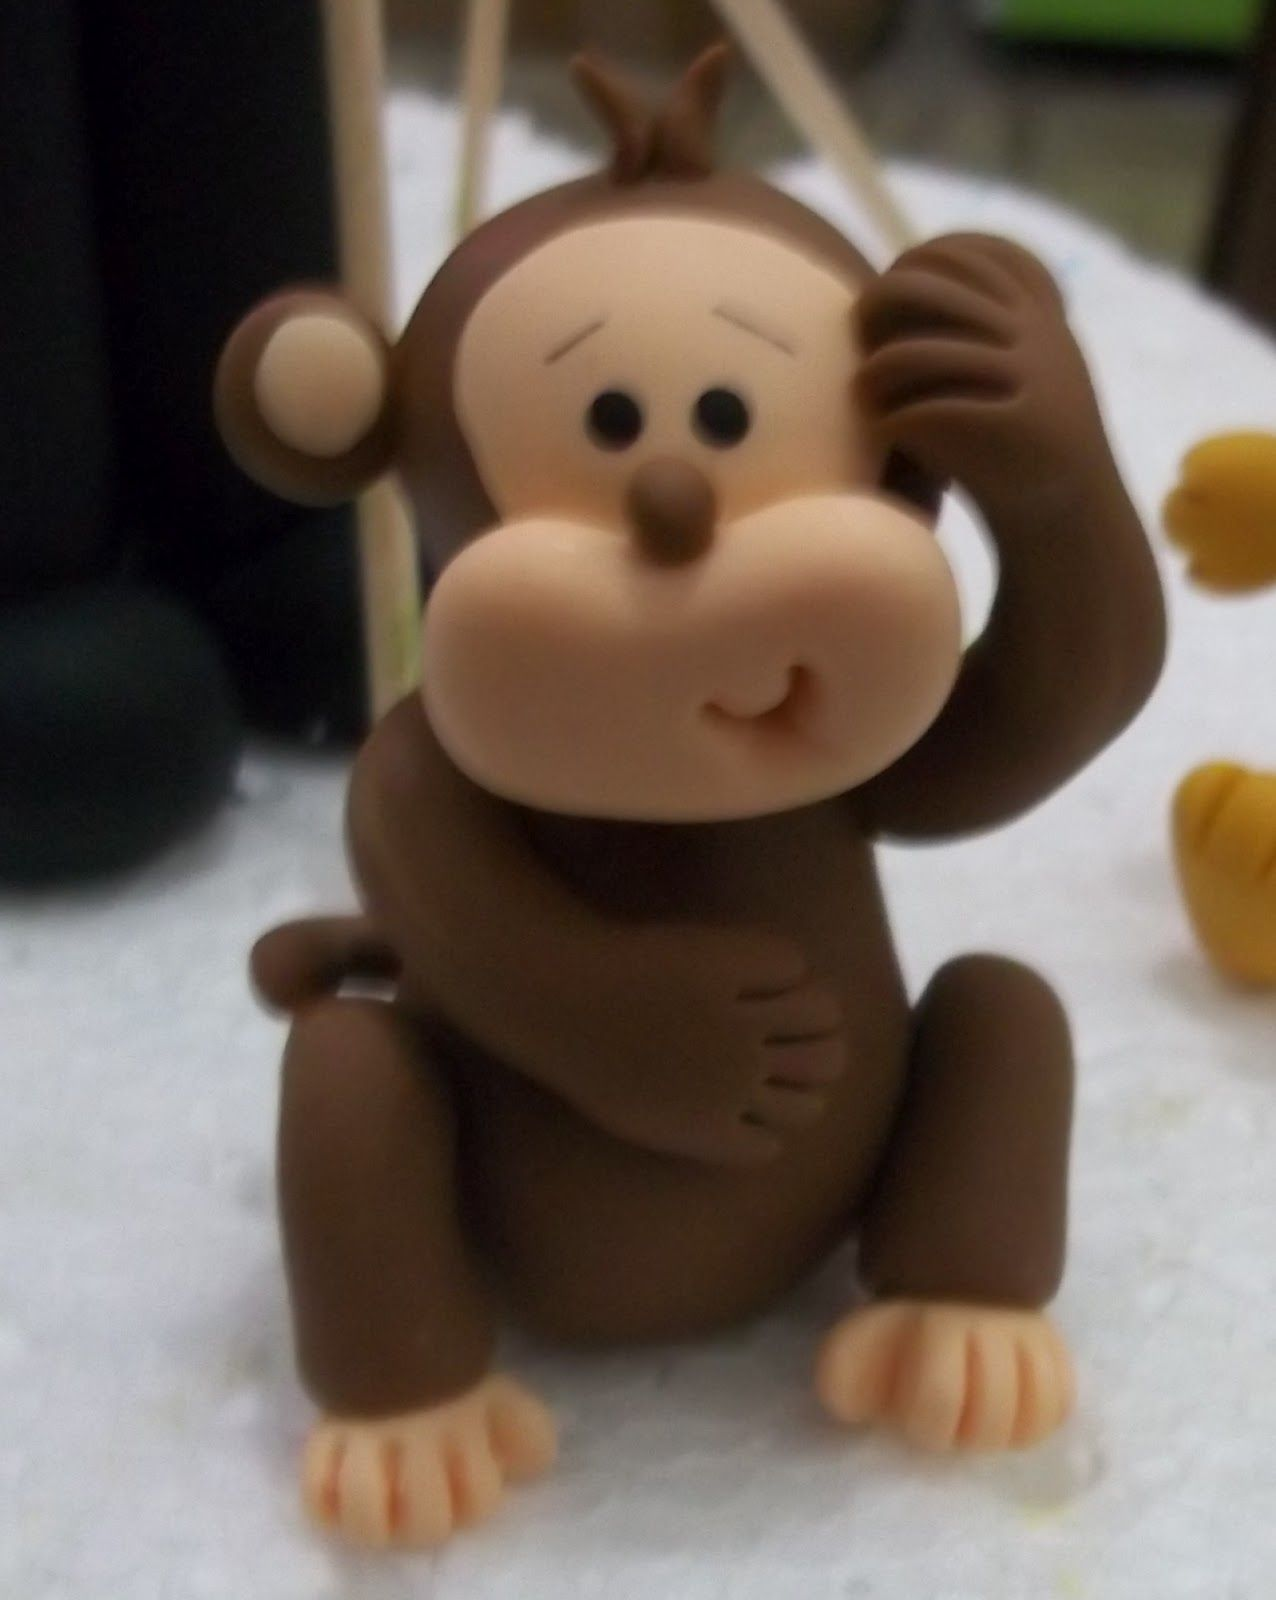 Pin De Nancy Gillis Em Miniature Crafts Biscuit Porcelana Fria